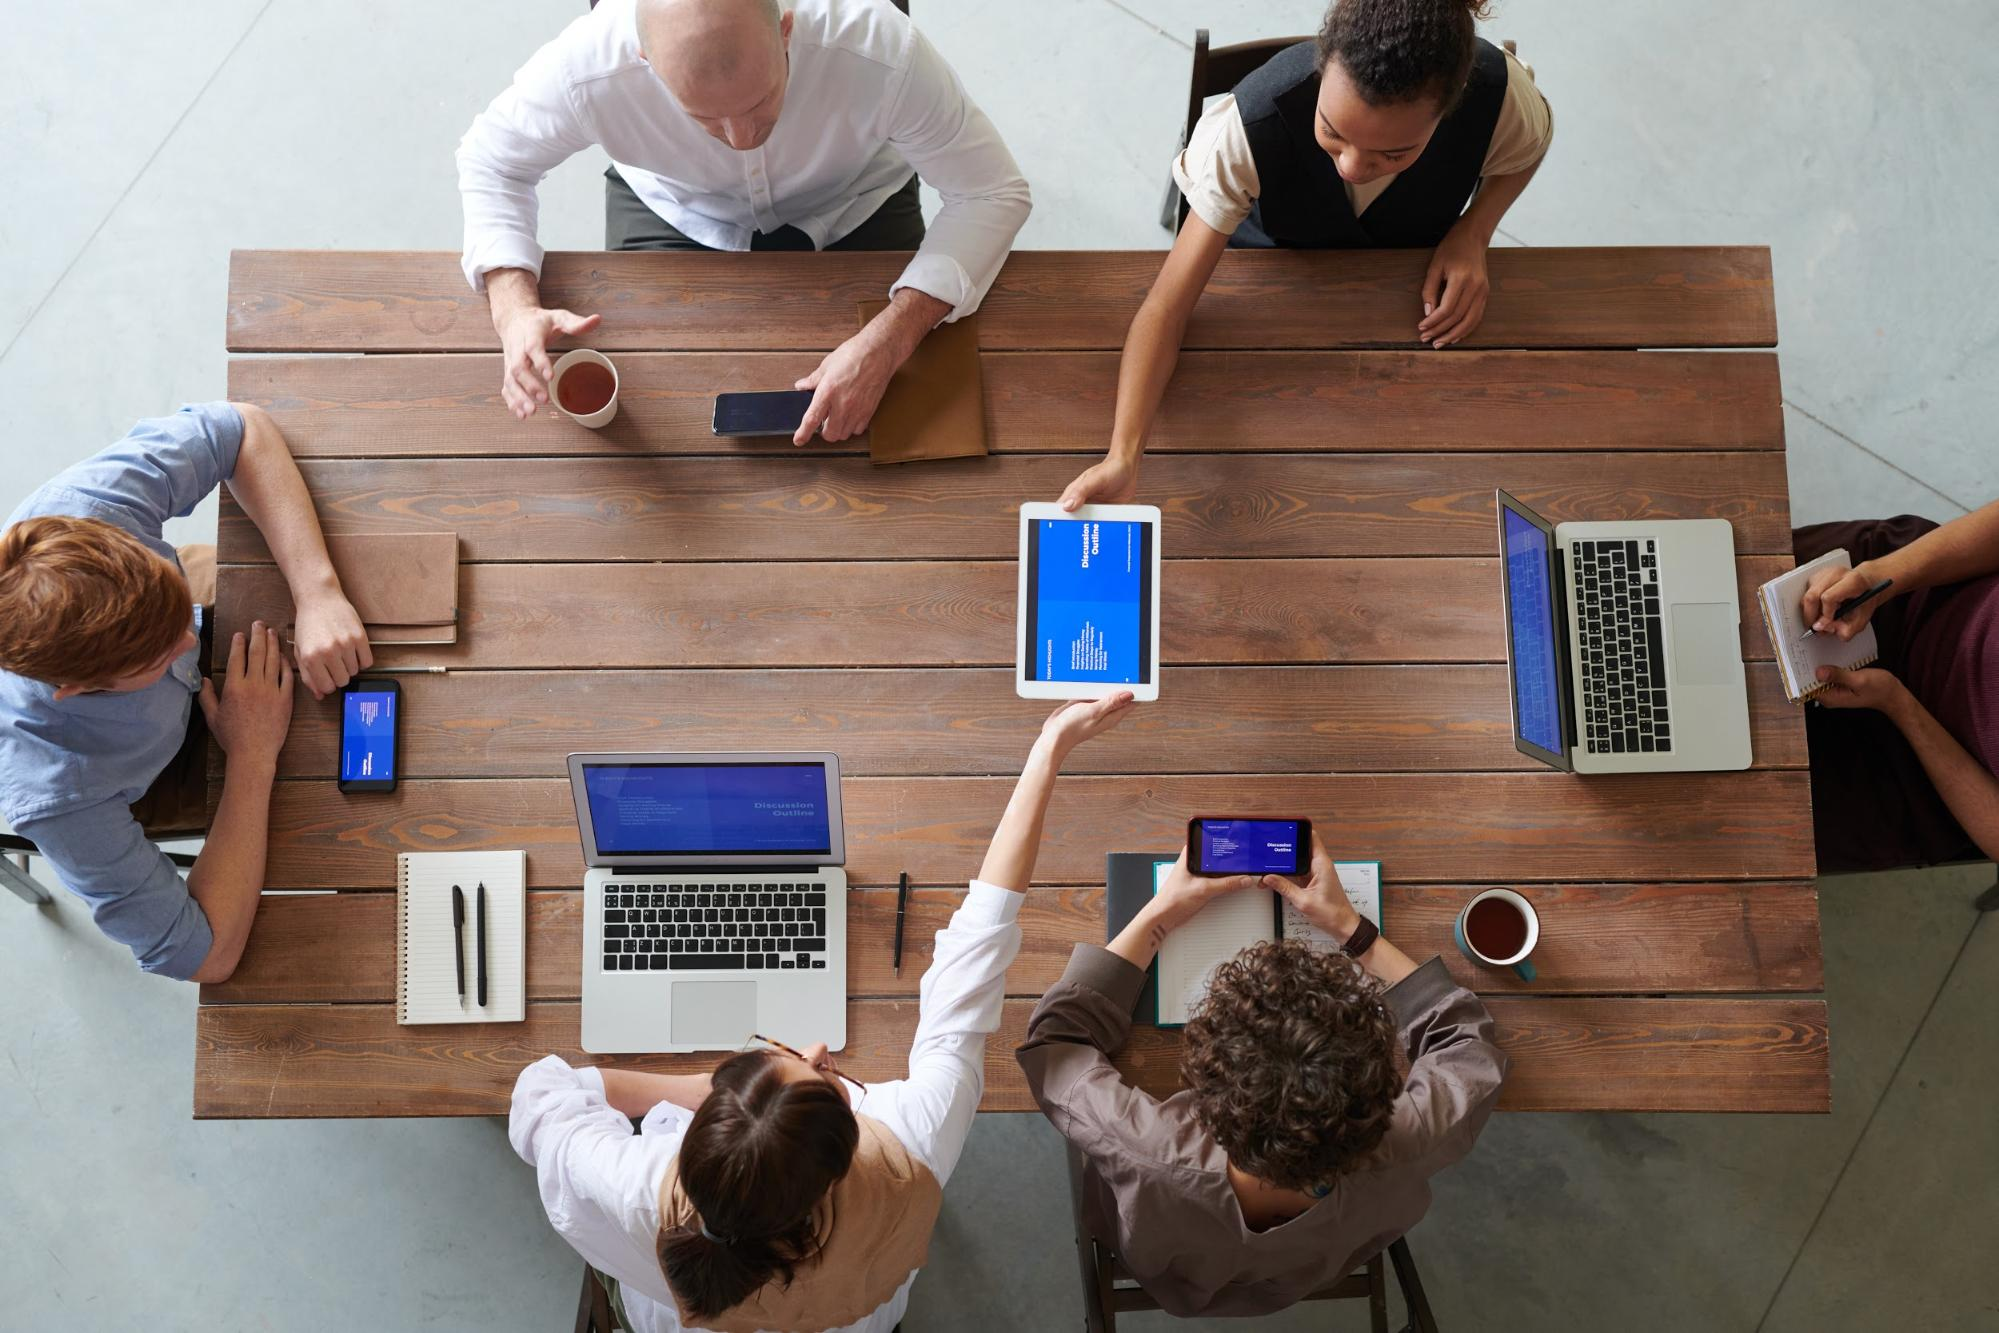 One team - Benefits of cross-platform app development 2